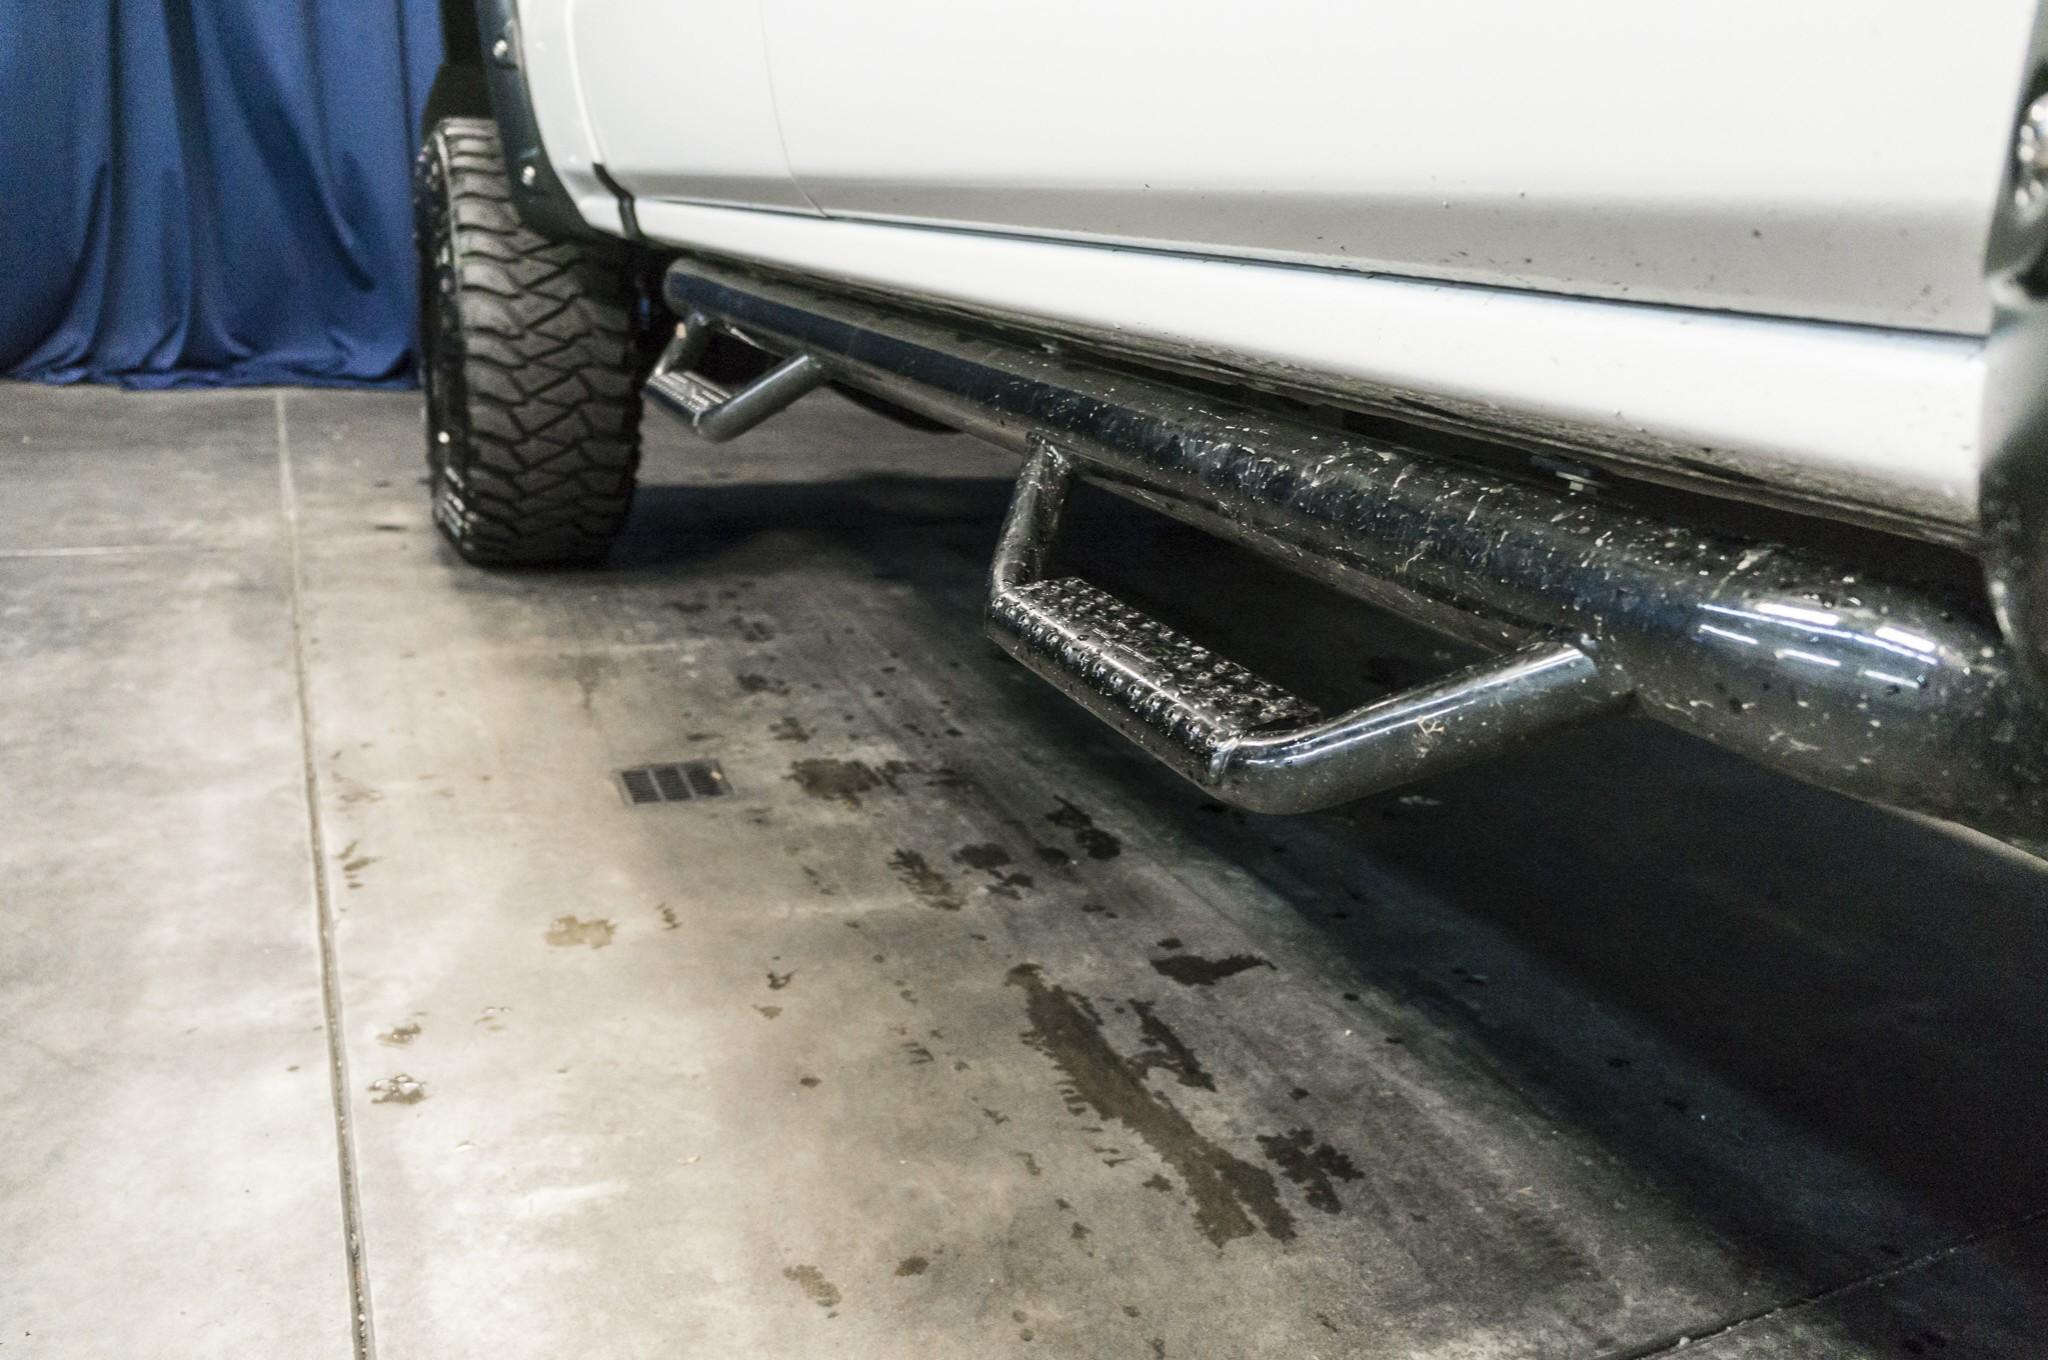 used lifted 2016 gmc sierra 3500 all terrain 4x4 diesel truck for sale 37076. Black Bedroom Furniture Sets. Home Design Ideas